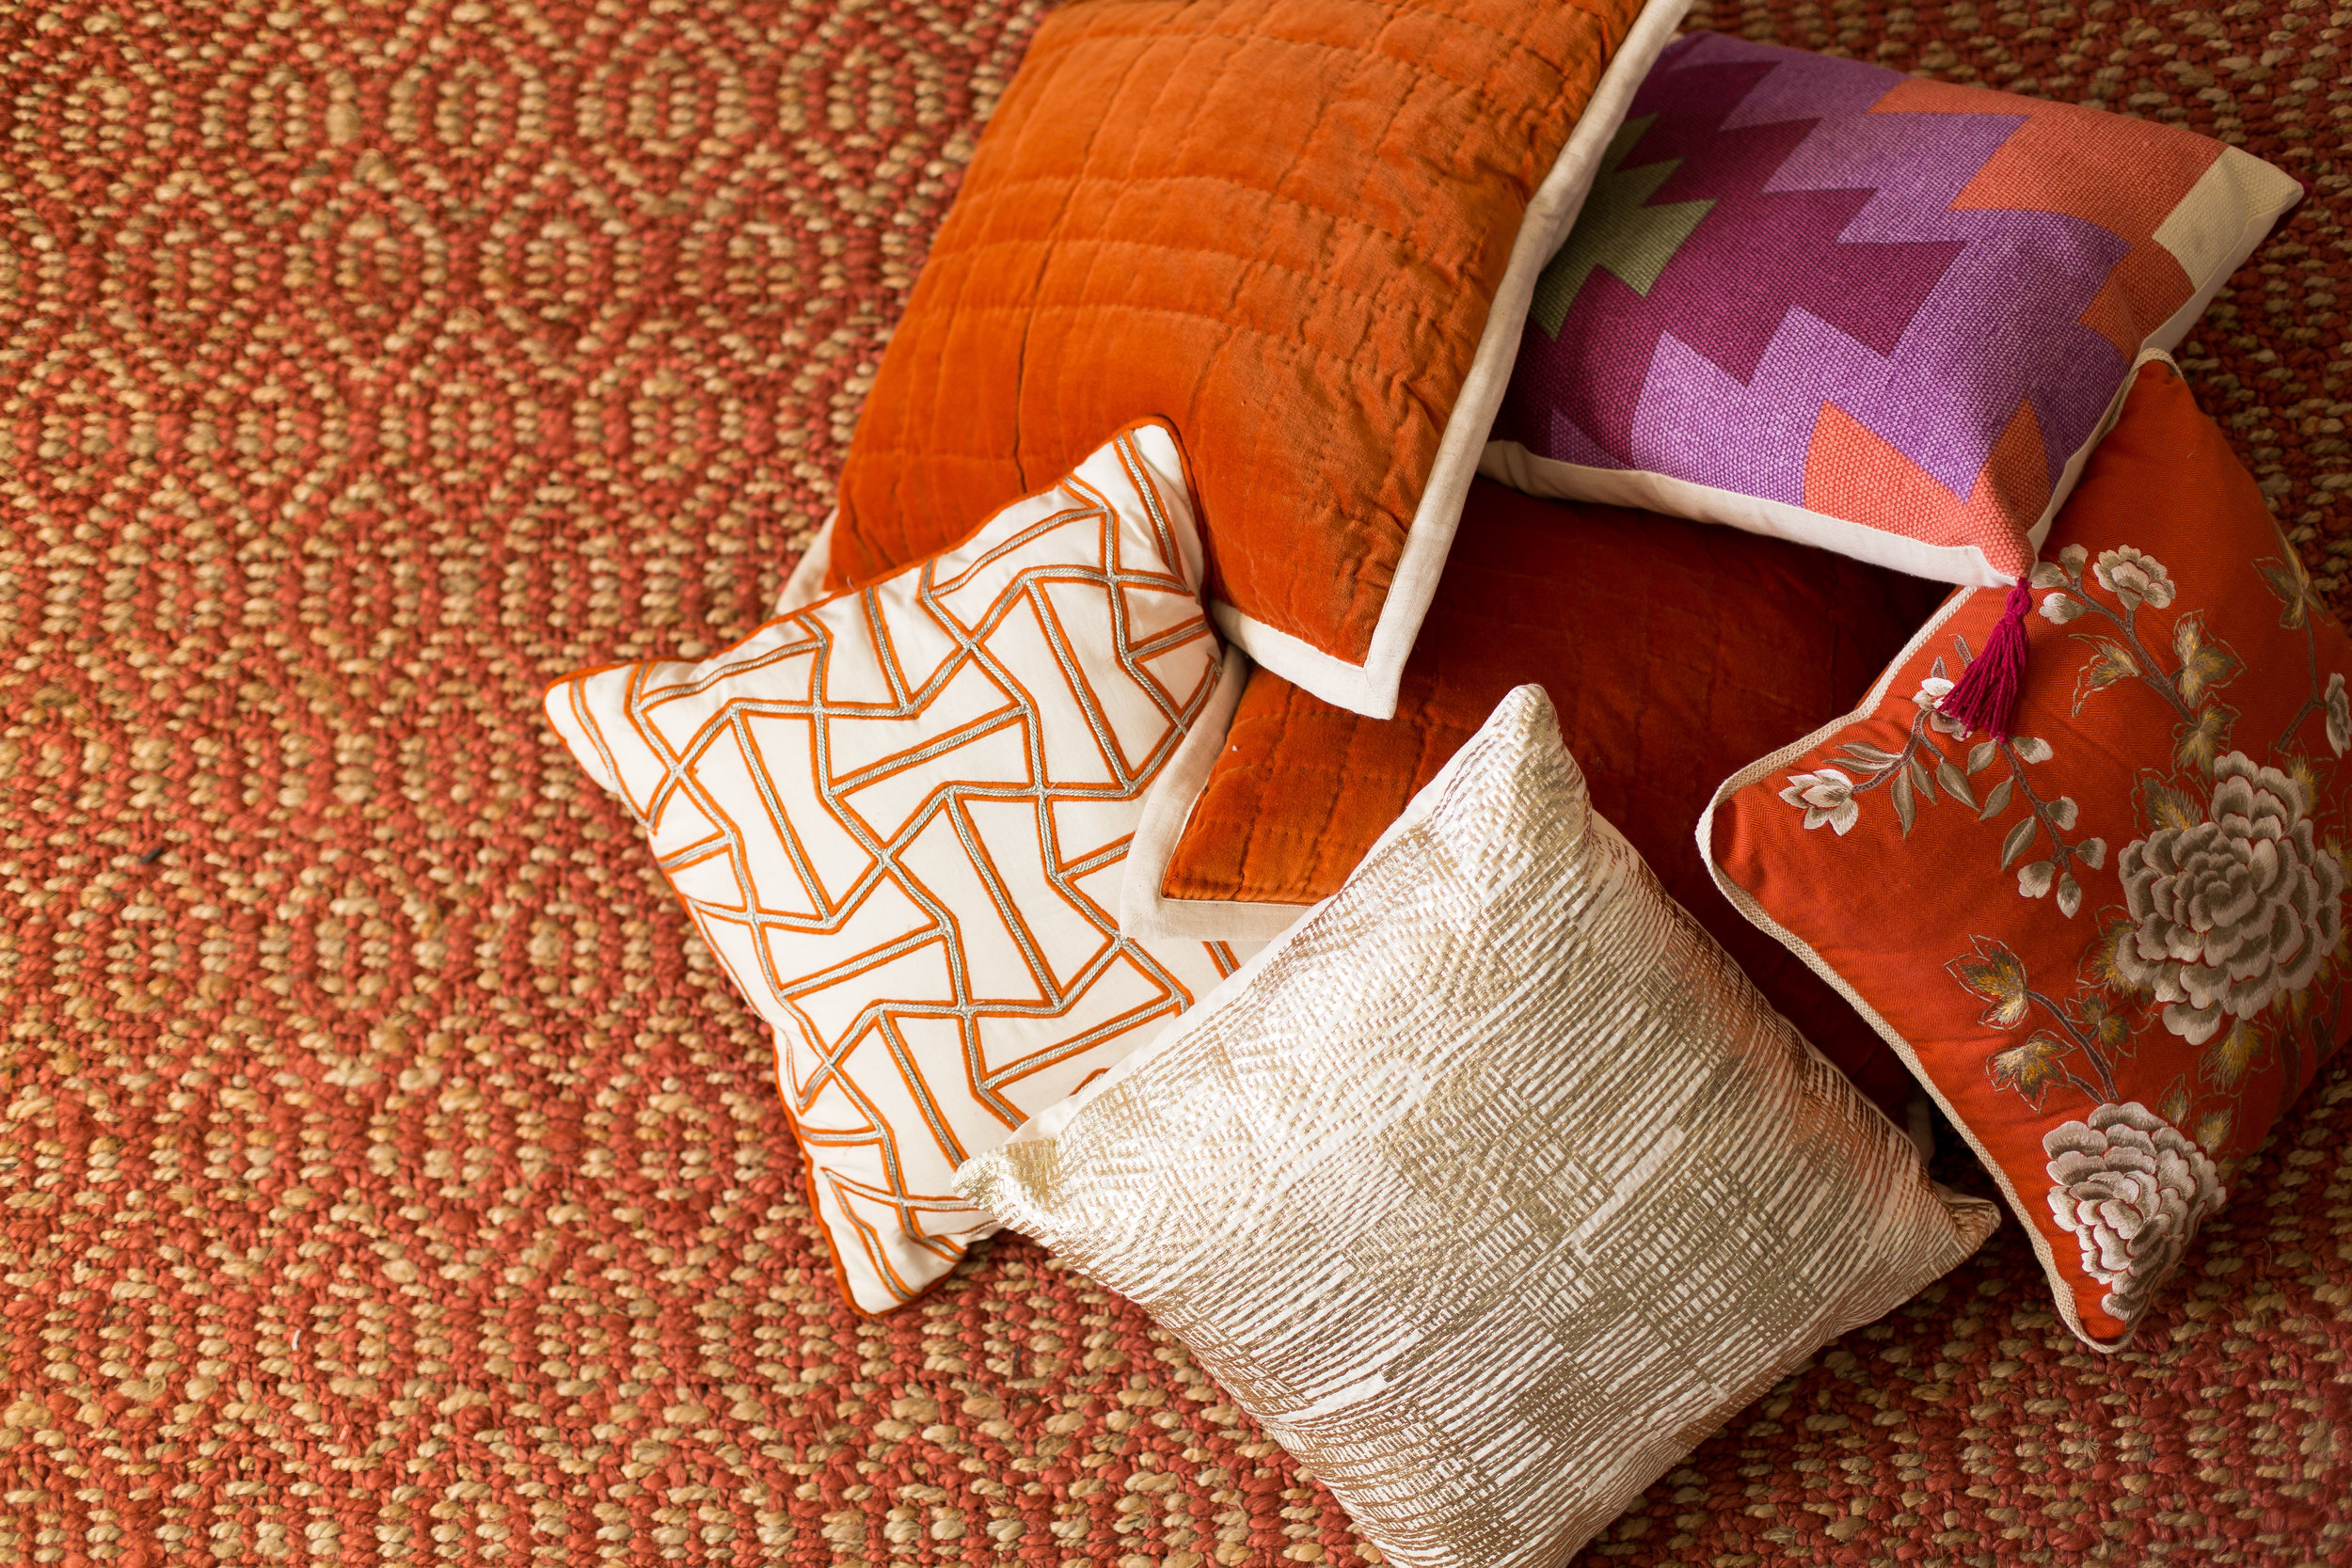 Dayka Robinson Budget Decorating pattern mix rust sisal pillows.jpg